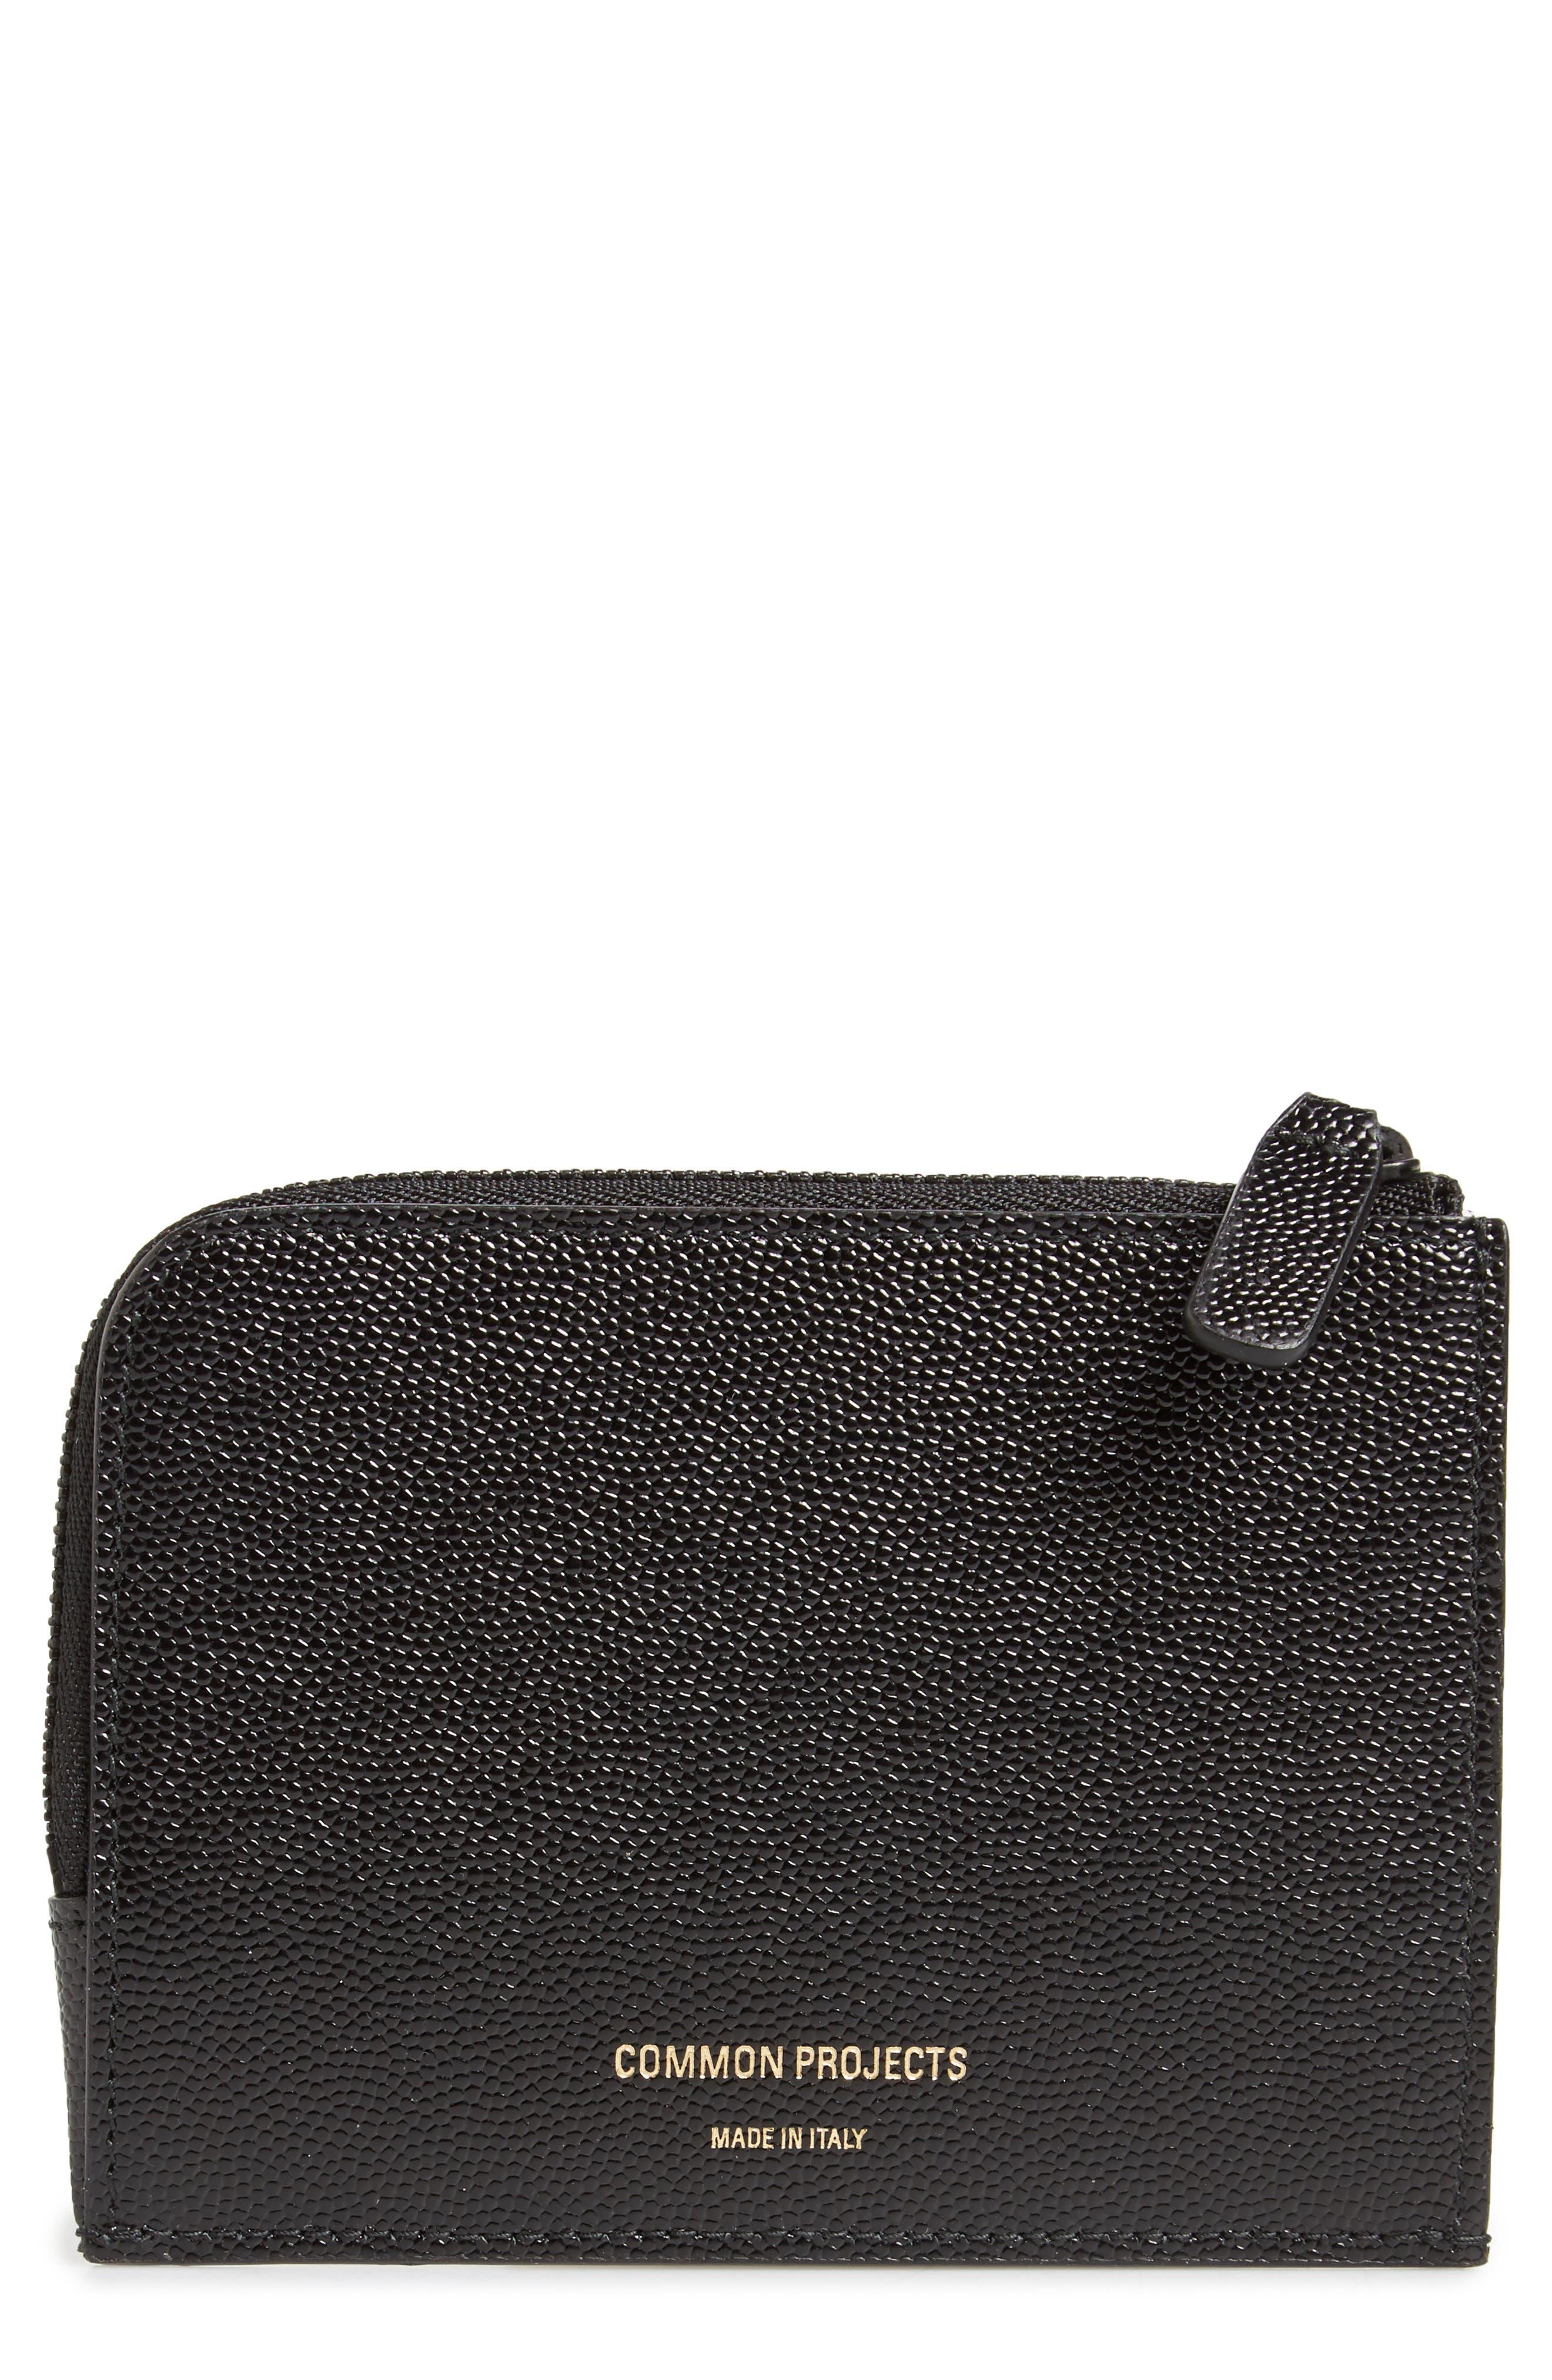 Pebble Leather Zip Wallet,                             Main thumbnail 1, color,                             001